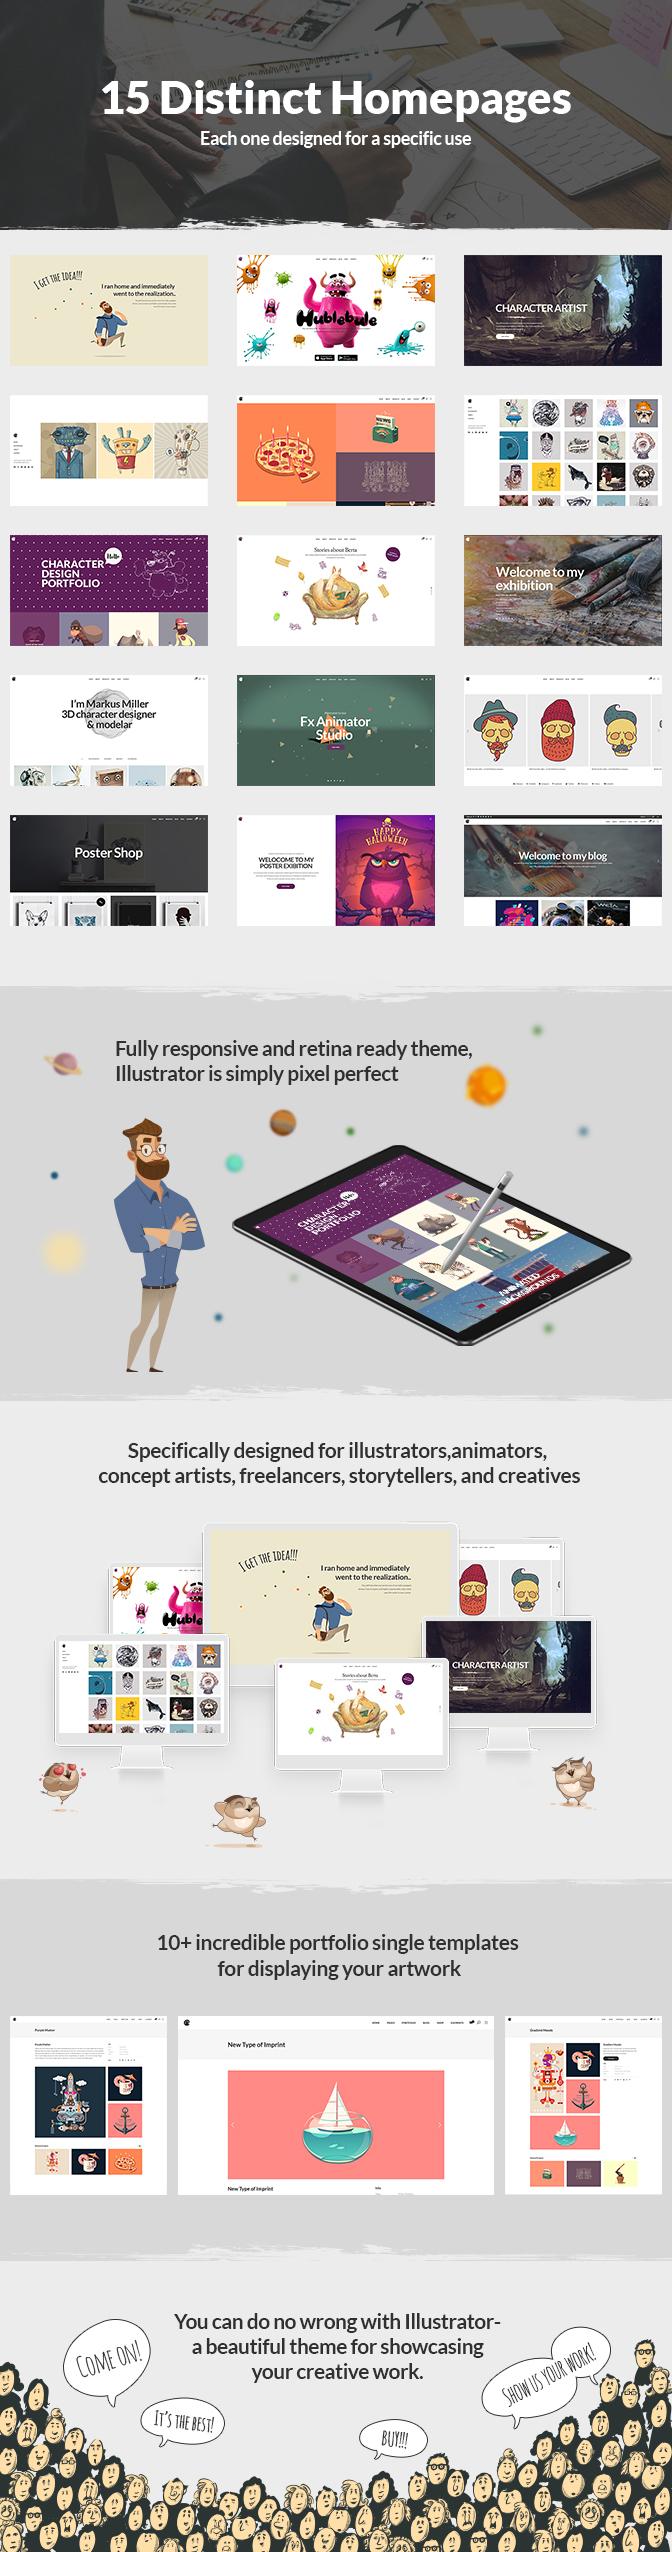 Illustrator - Illustrator, Designer and Artist Portfolio Theme - 1